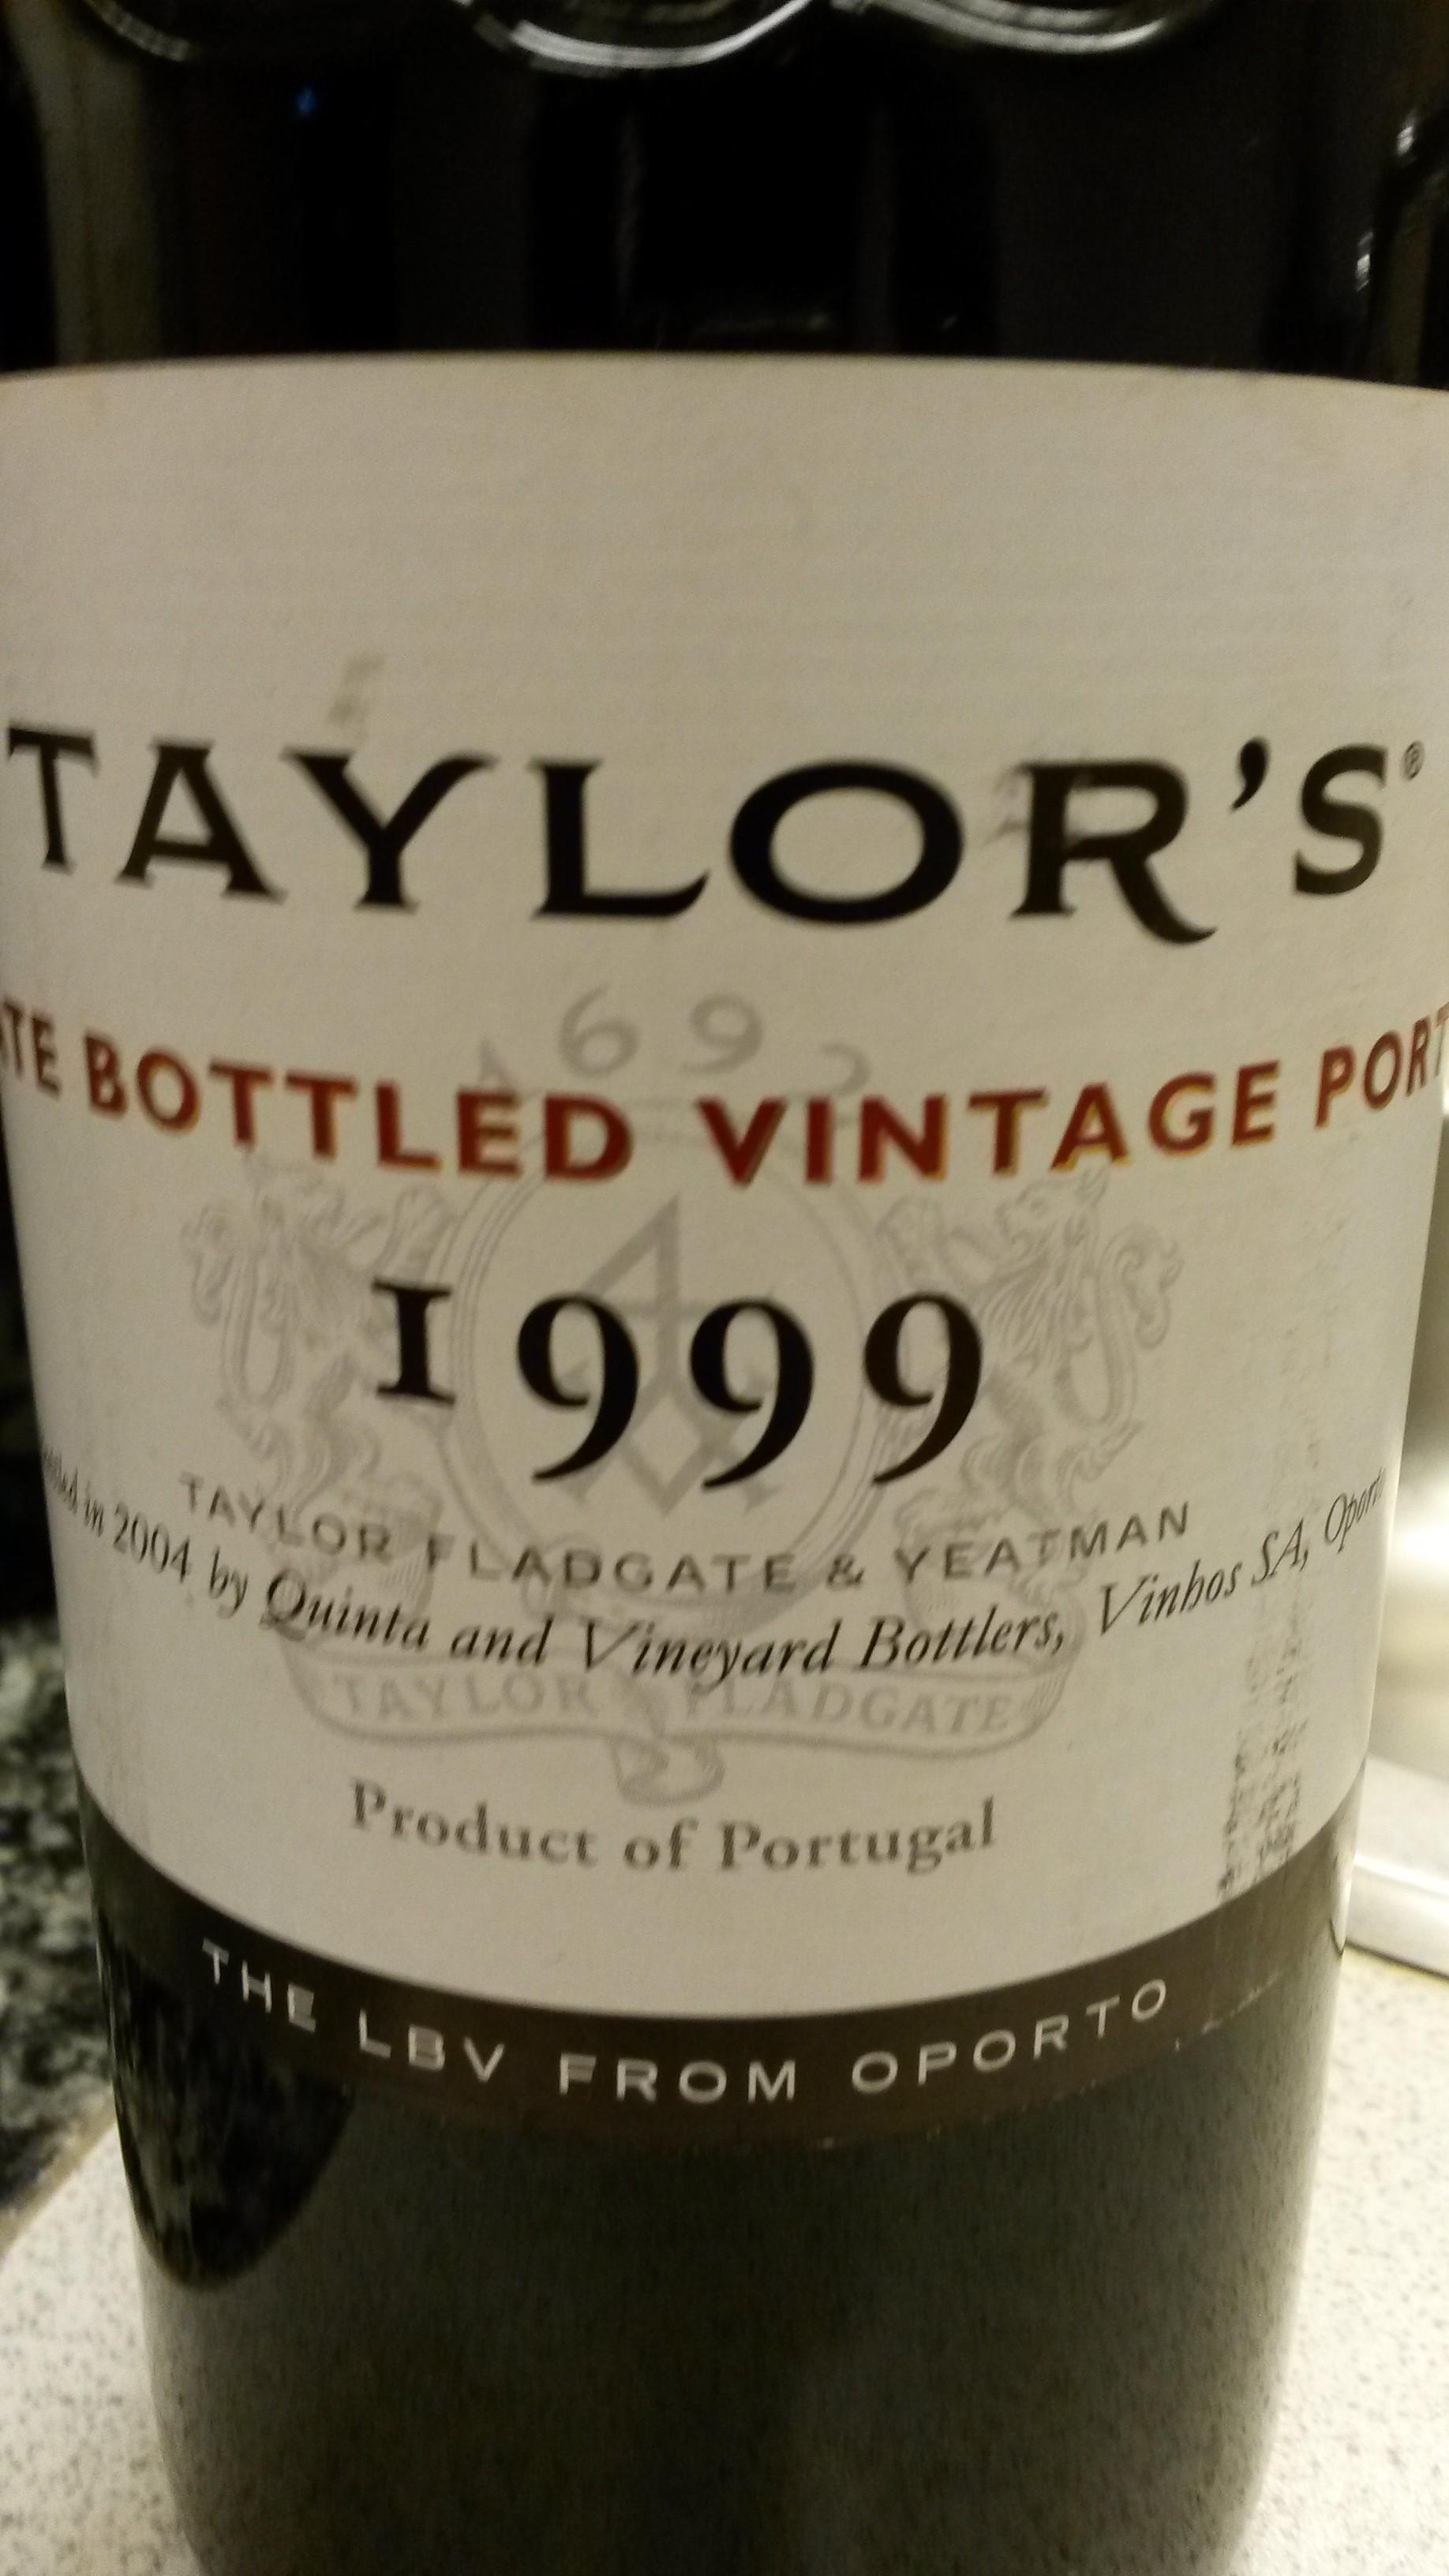 taylors-lbv-1999